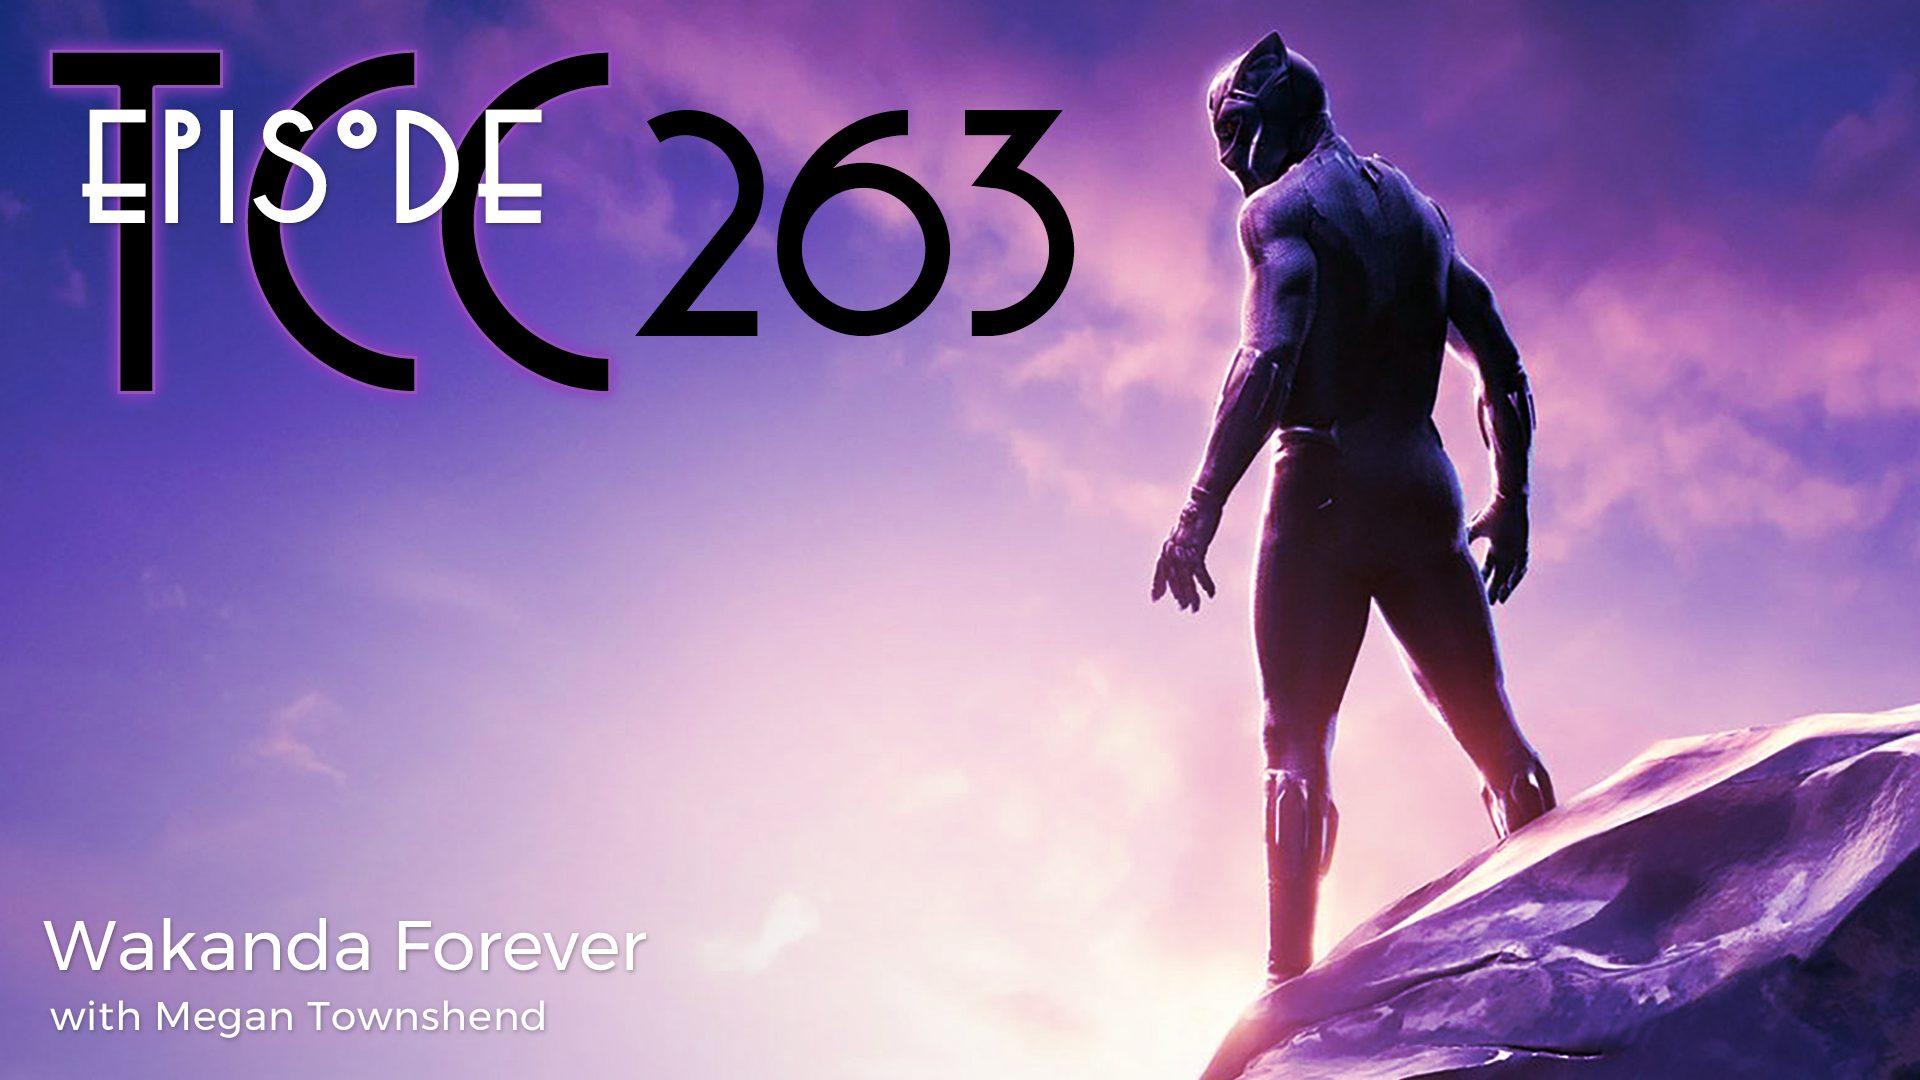 The Citadel Cafe 263: Wakanda Forever